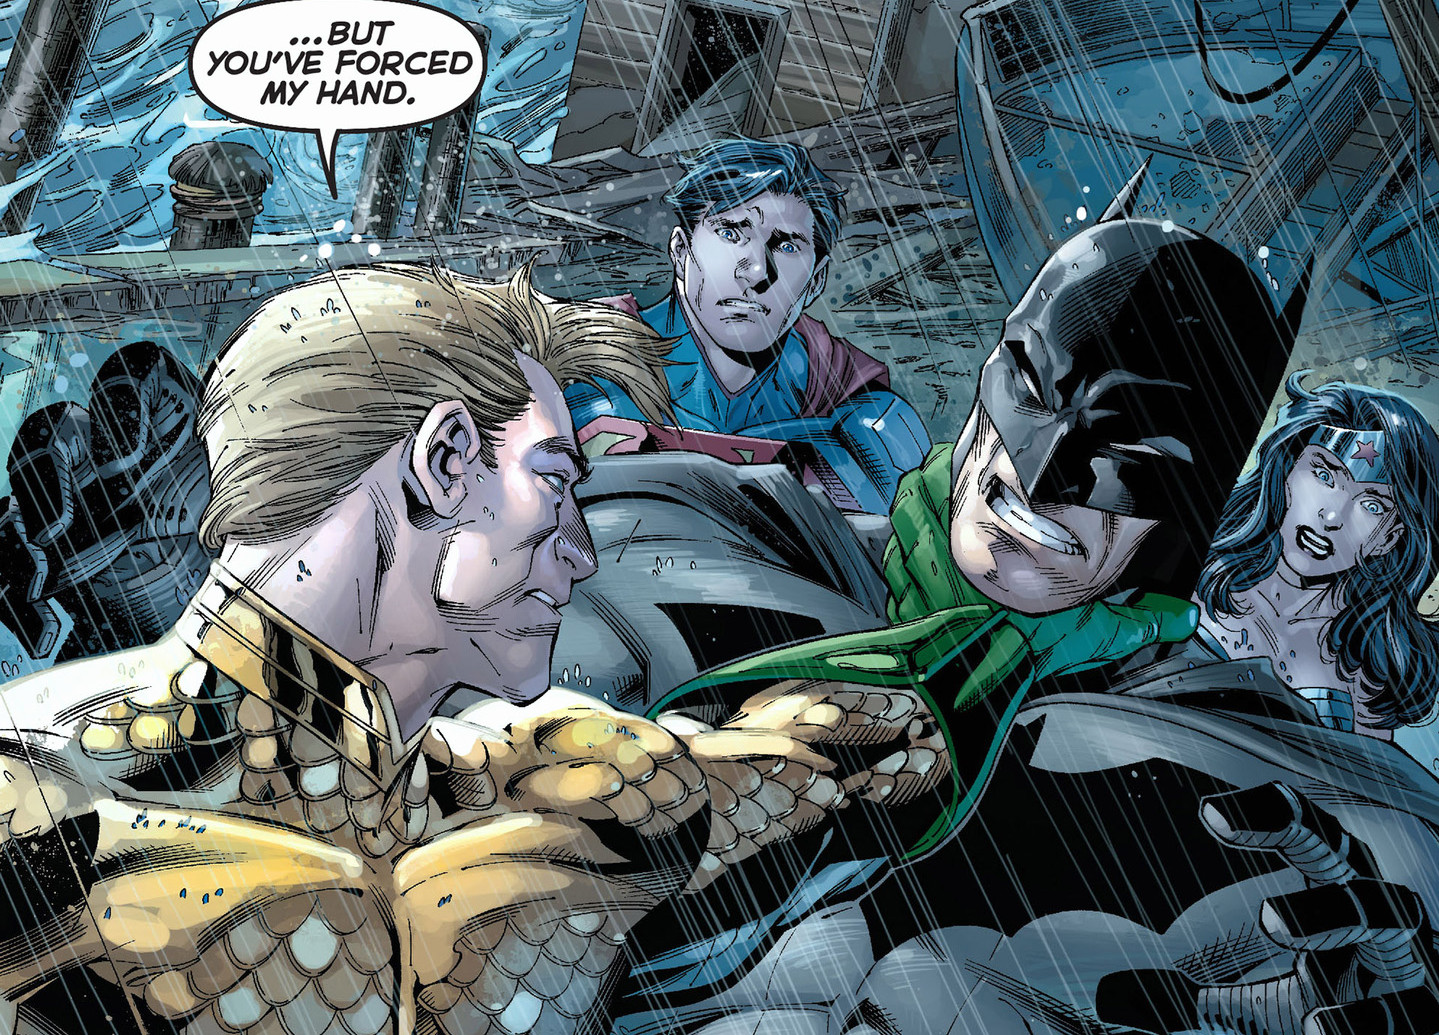 The Namazing Spider Man further 31 Batman Memes That Are So Funny Knights Will Laugh moreover Restoration Cyborg Walker Reis in addition 3613943 moreover Jason Momoa Says Aquaman Wont Be Butt Jokes After Batman V Superman. on marvel superhero jokes